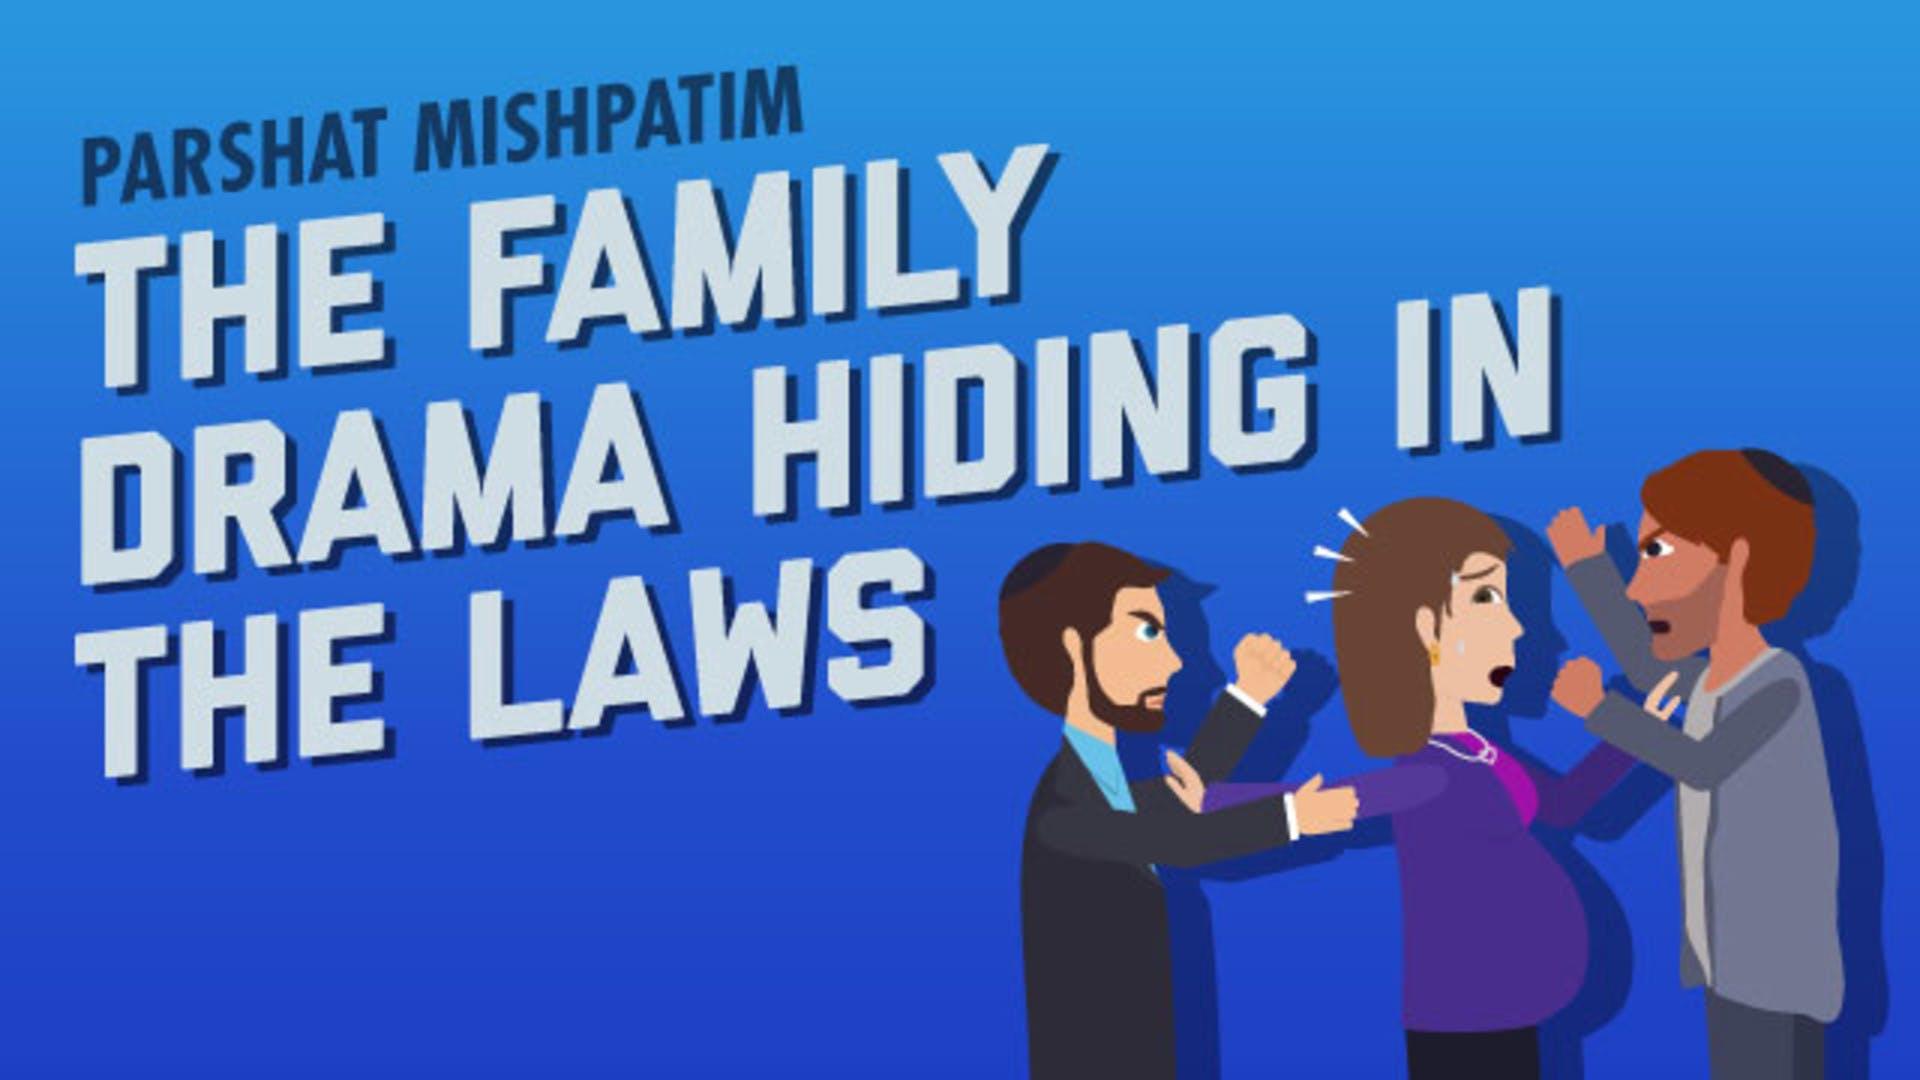 Mishpatim laws